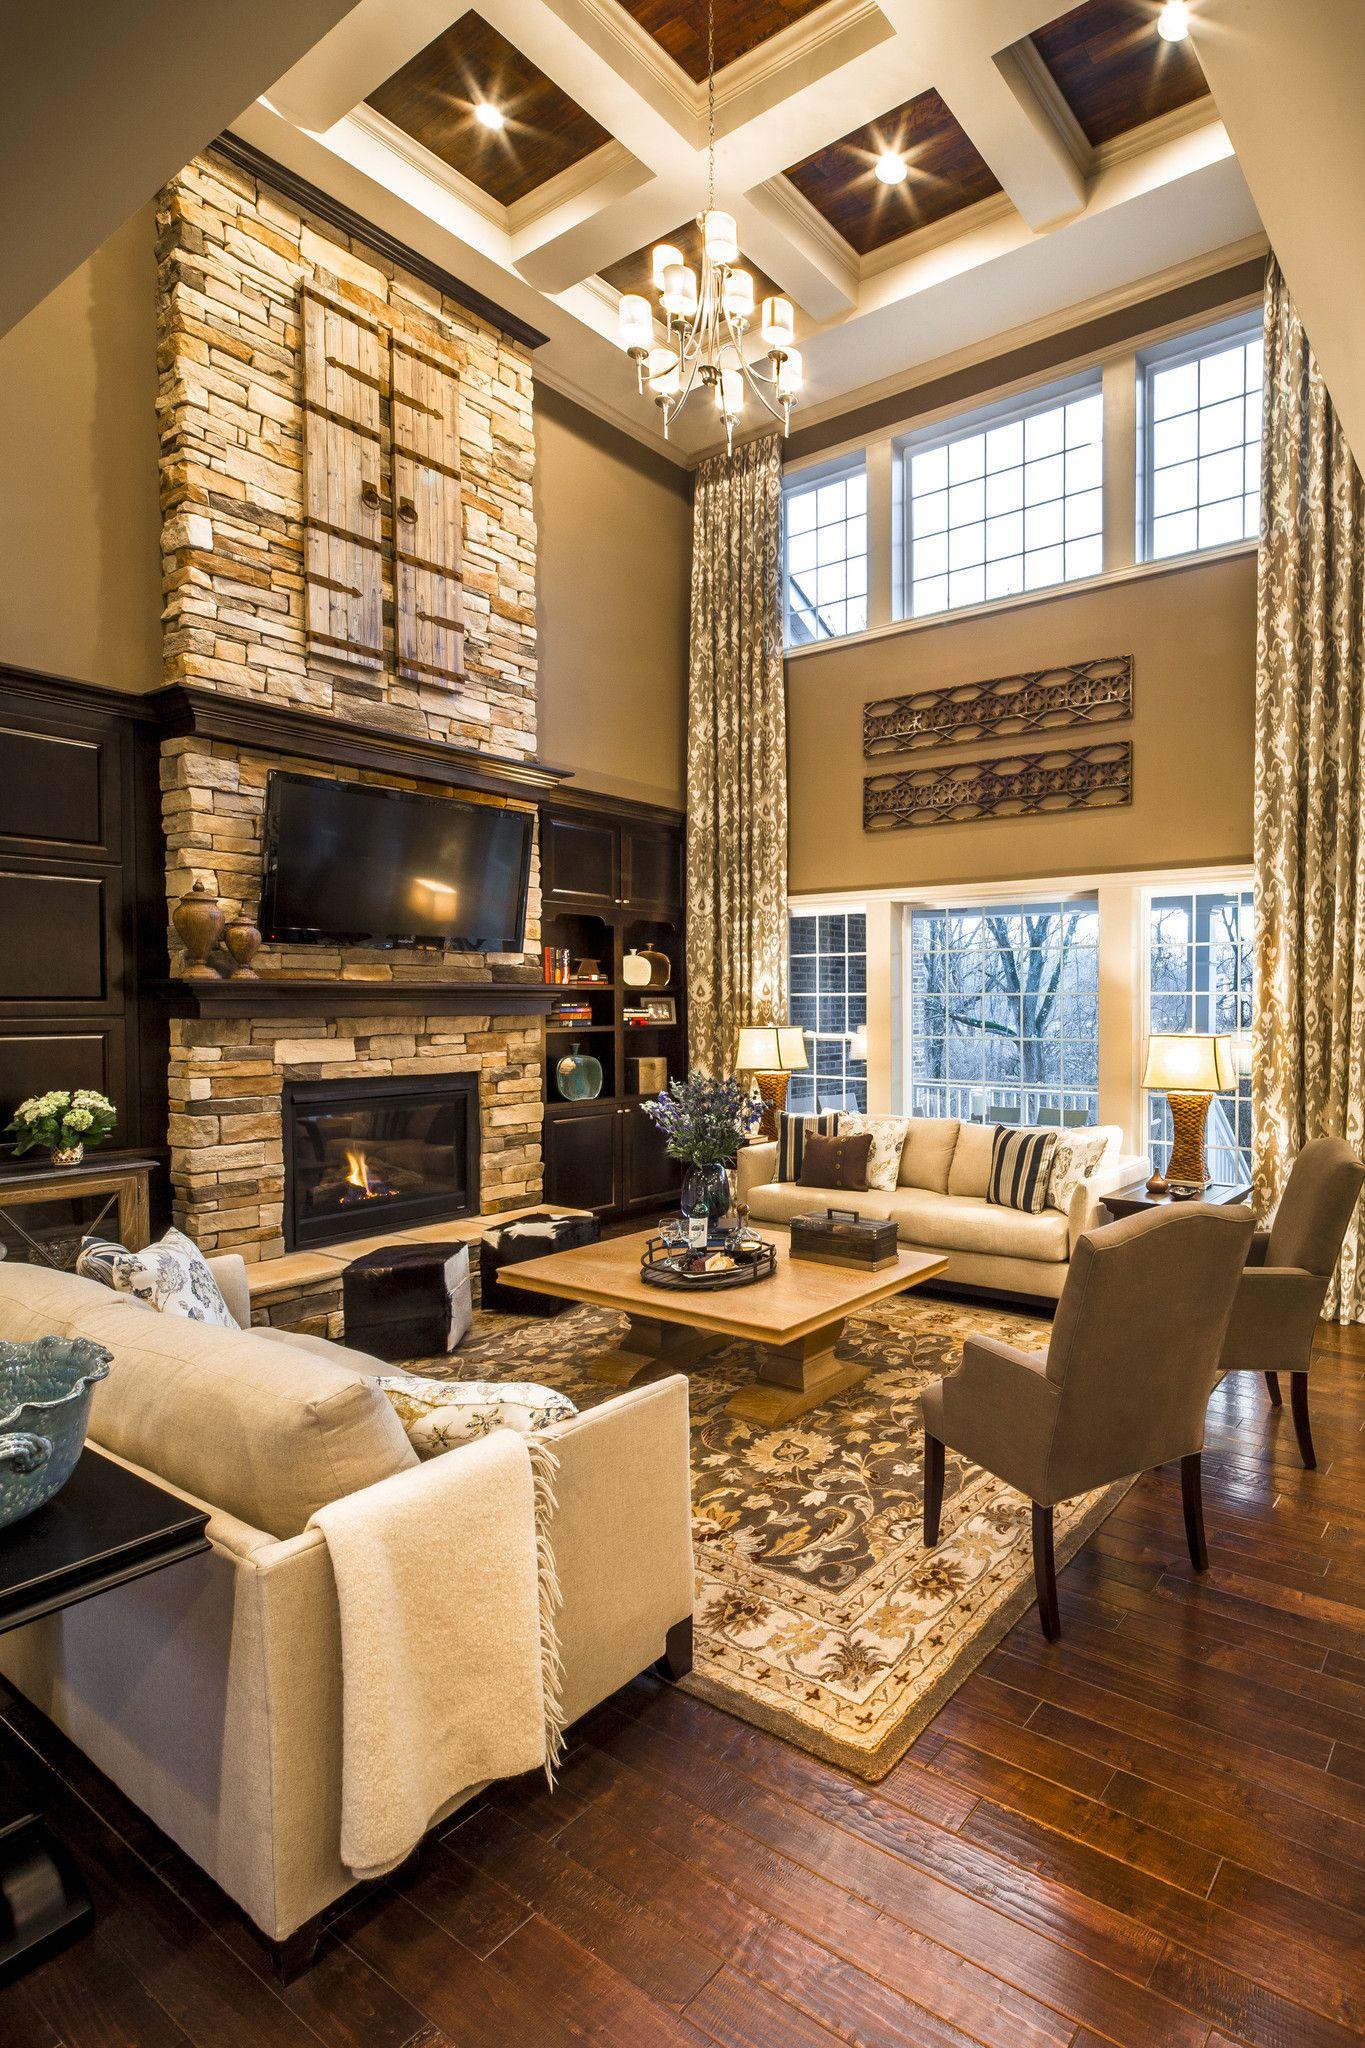 Itus an ageold real estate scenario Buyers walk through a home for